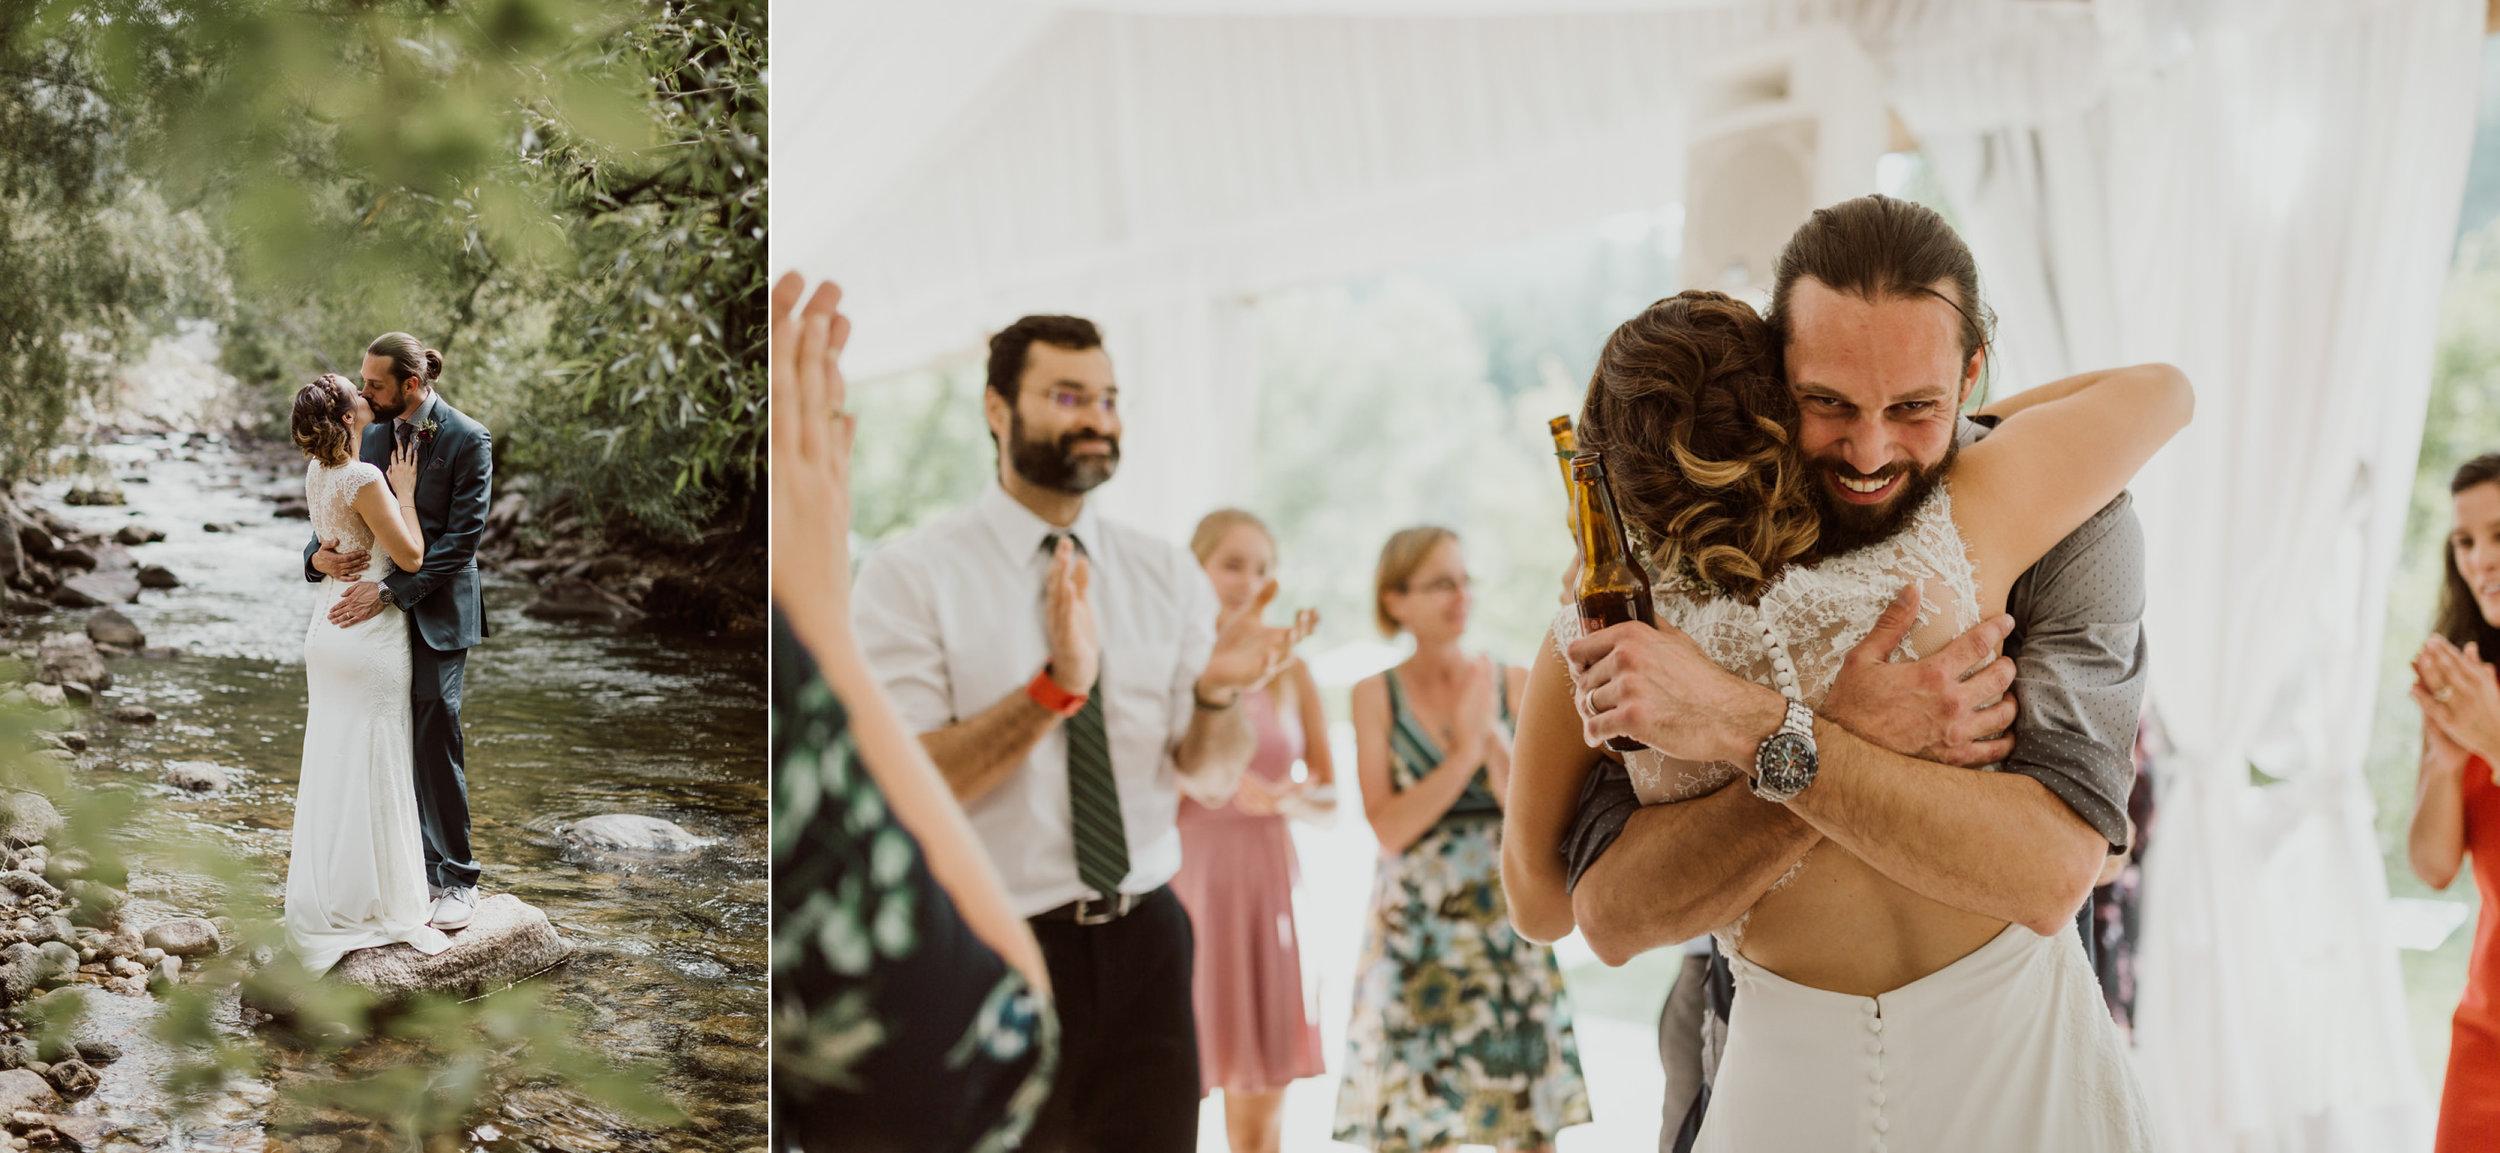 17-9-adventure-wedding-photographer-31.jpg